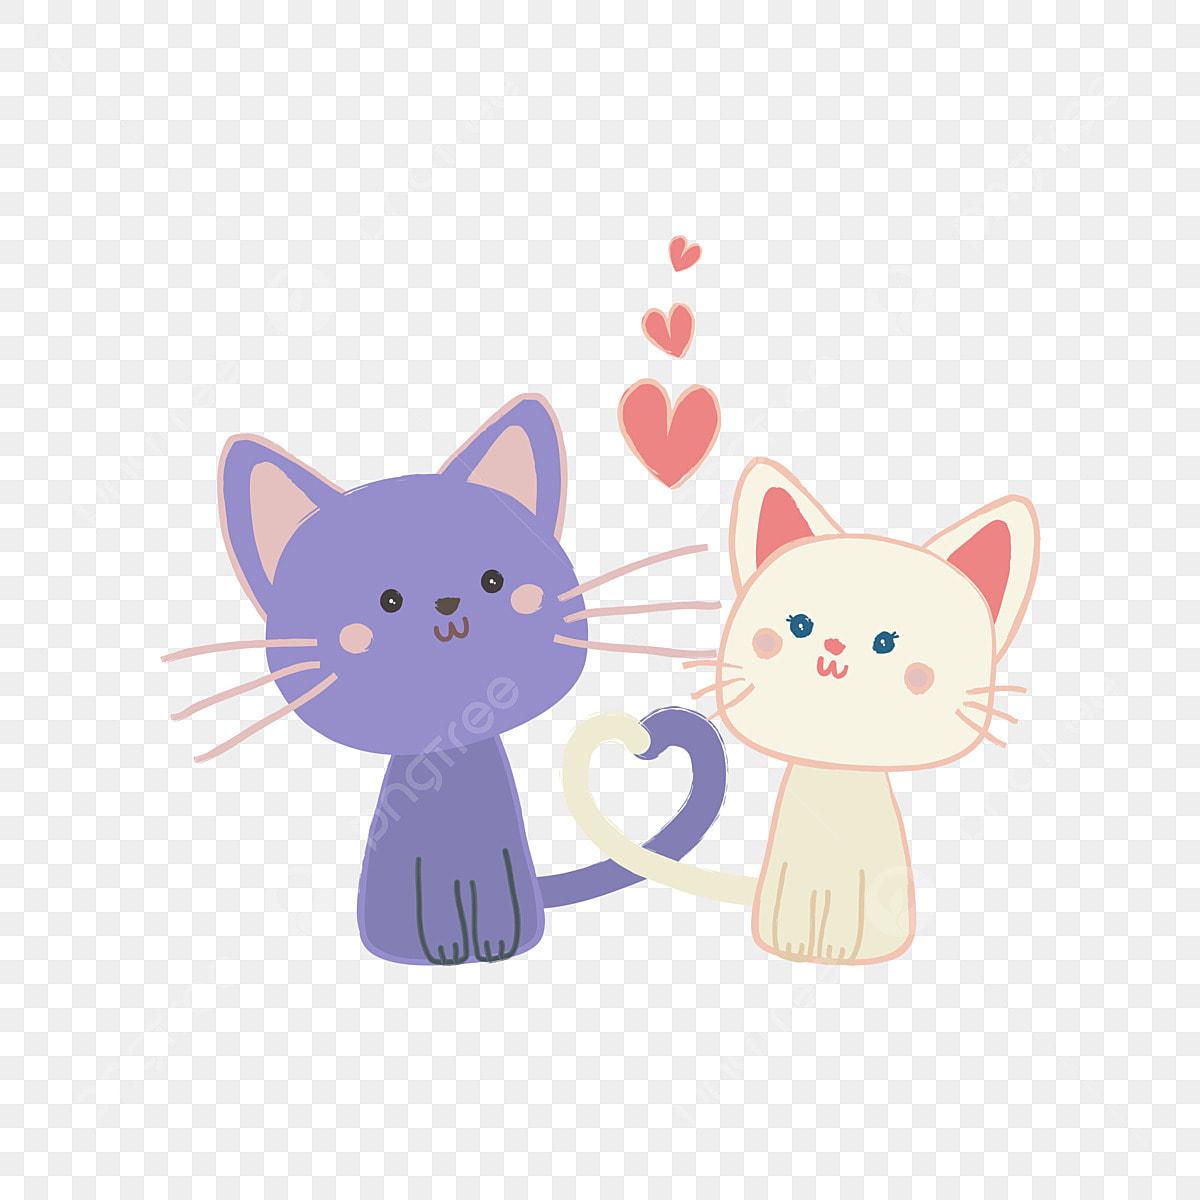 600+ Gambar Binatang Kartun Kucing Gratis Terbaru